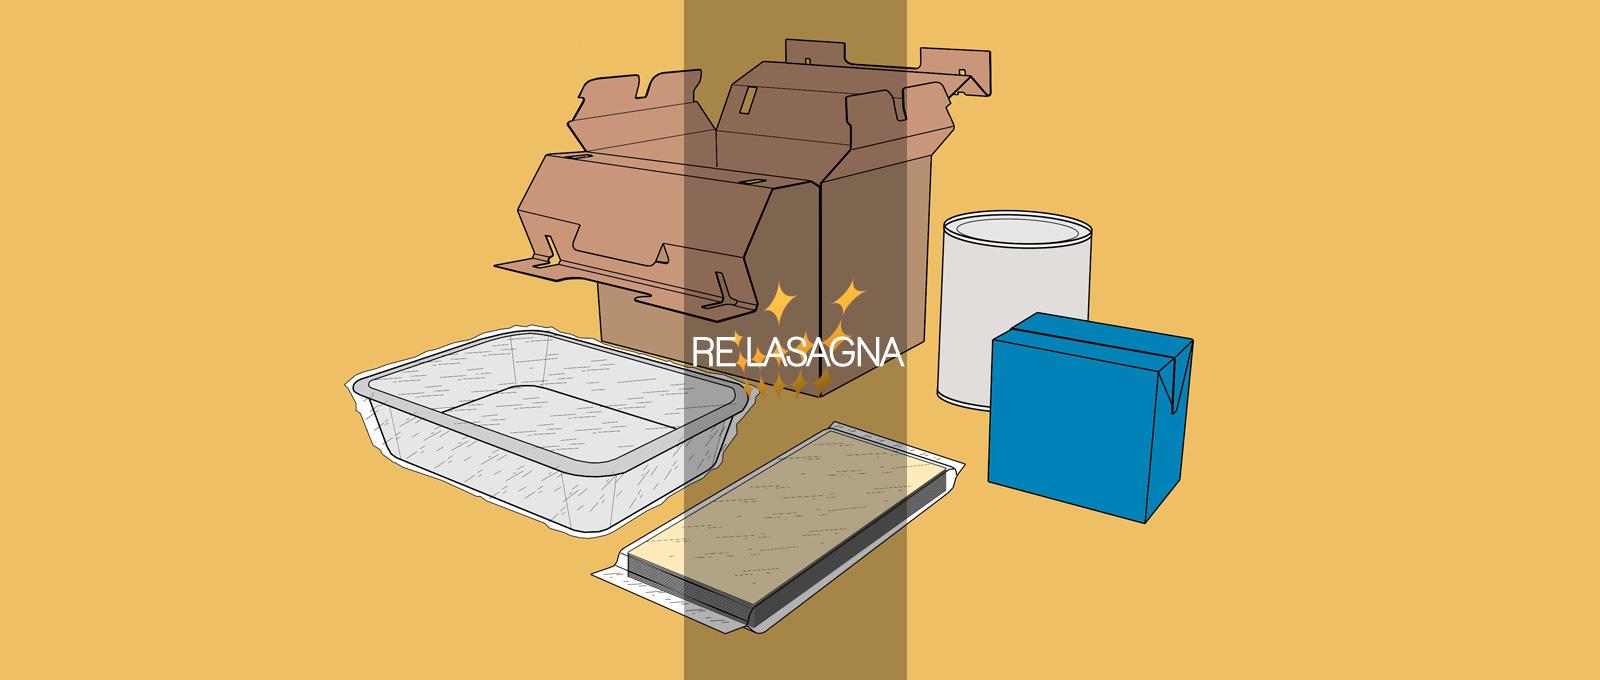 Re Lasagna Idea